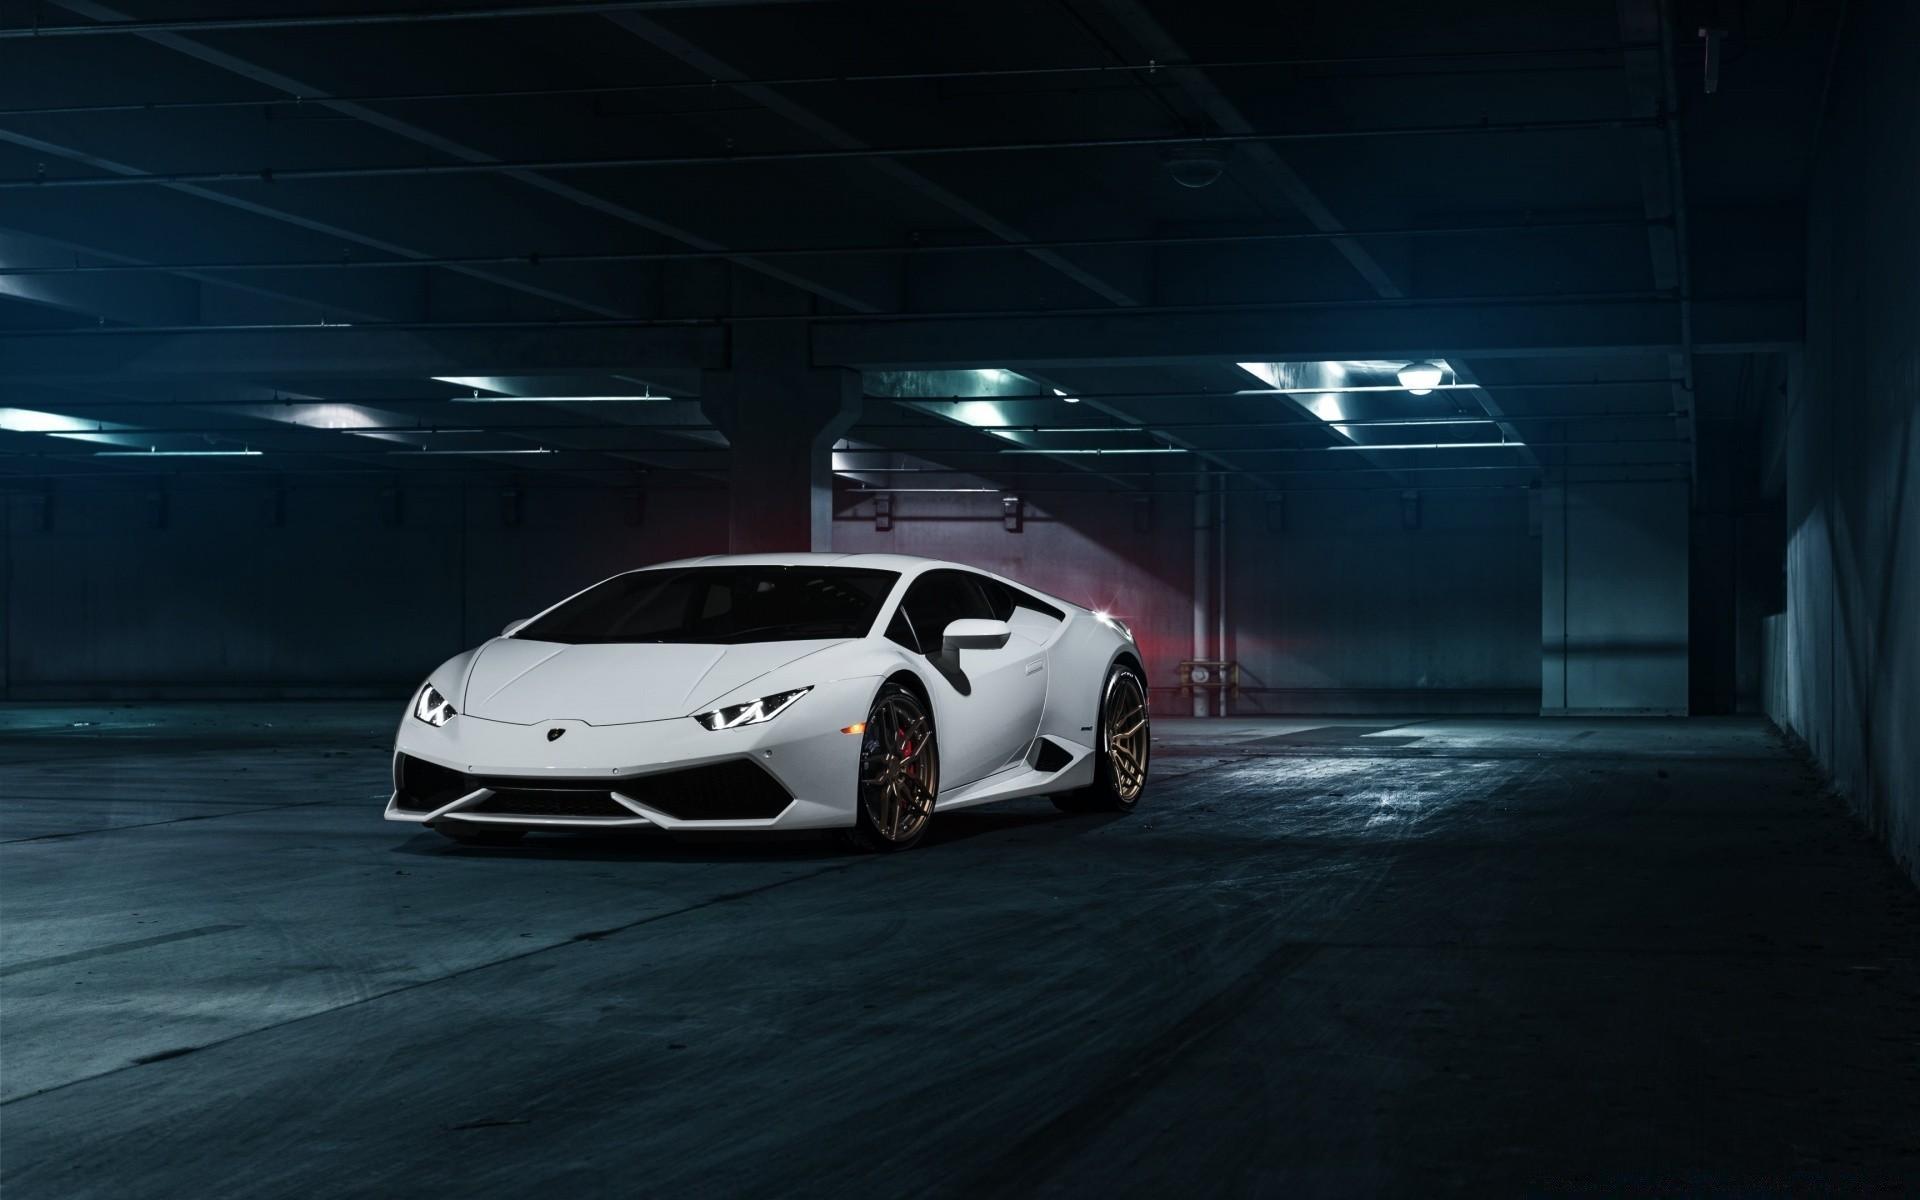 Lamborghini Huracan Lp 610 4 Adv1 Wheels Tuning 5 2l V10 Awd Rwd